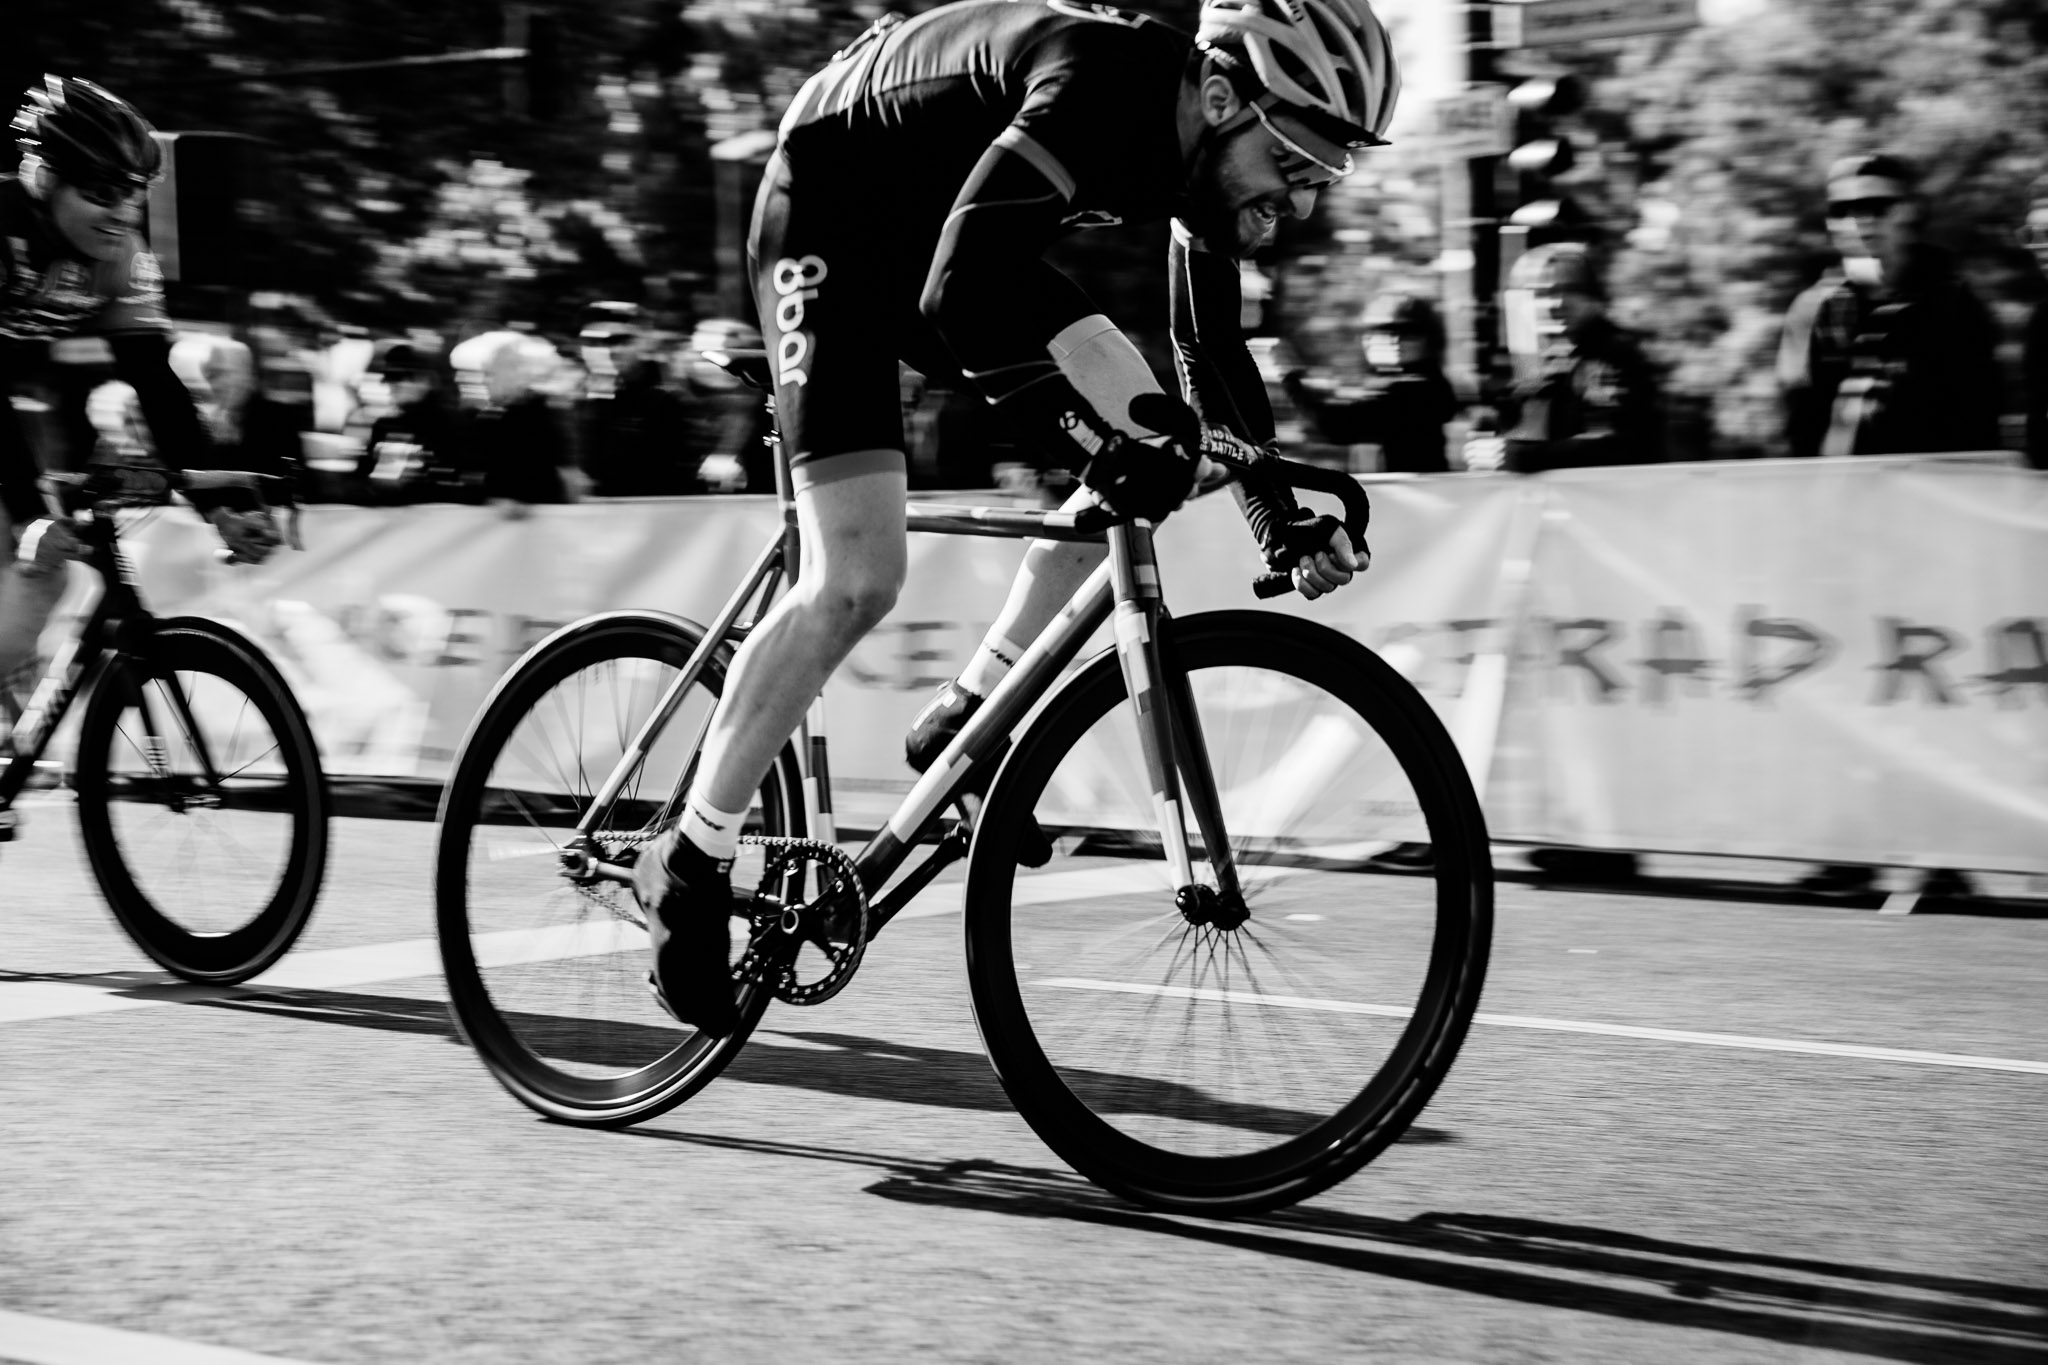 RAD RACE Battle, Berlin May 30 2015 Photo by Björn Lexius_21.jpg